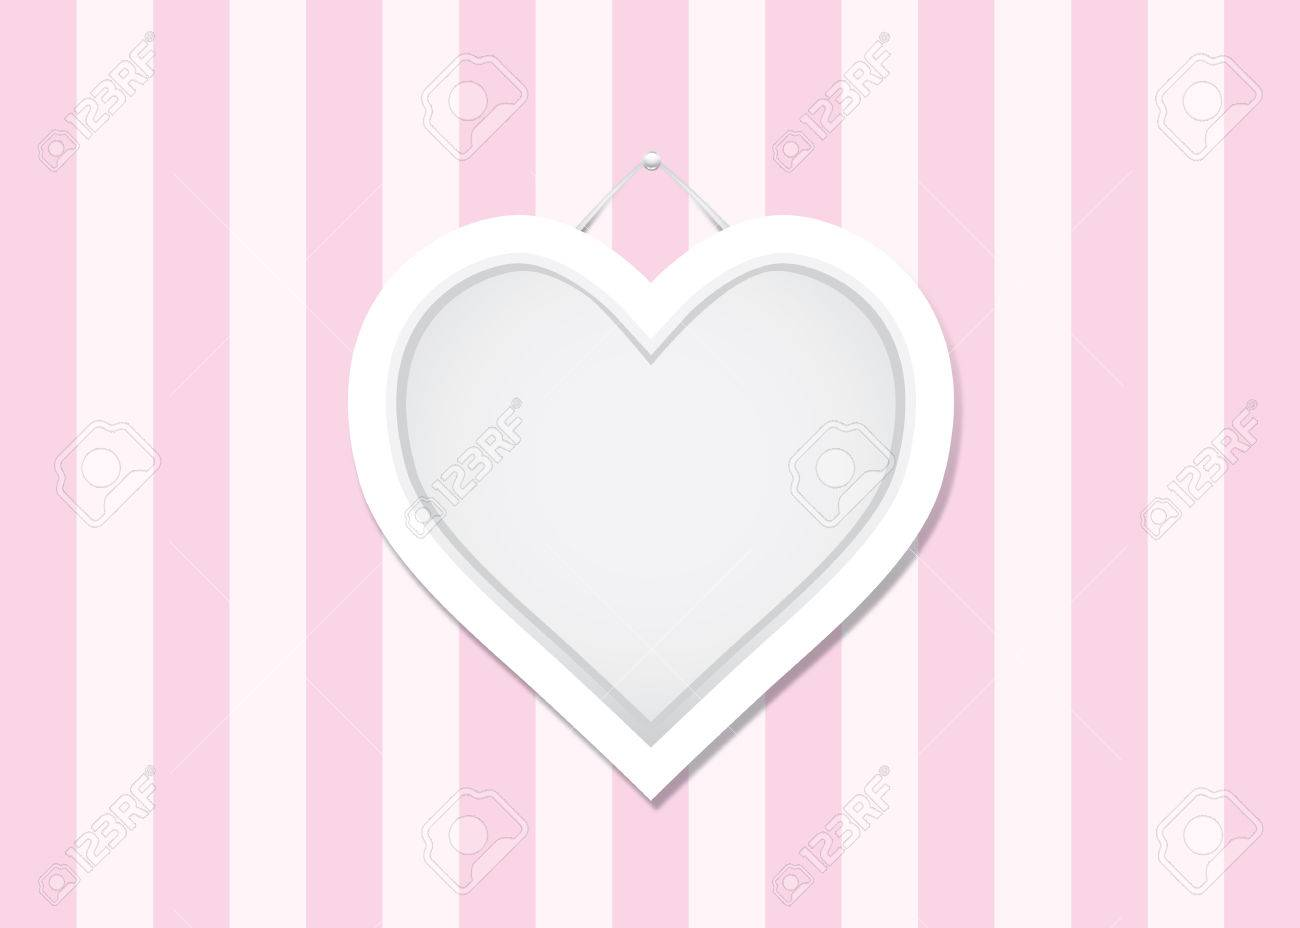 Herz-Form-Rahmen Auf Rosa Alternative Weiße Wand Lizenzfrei Nutzbare ...